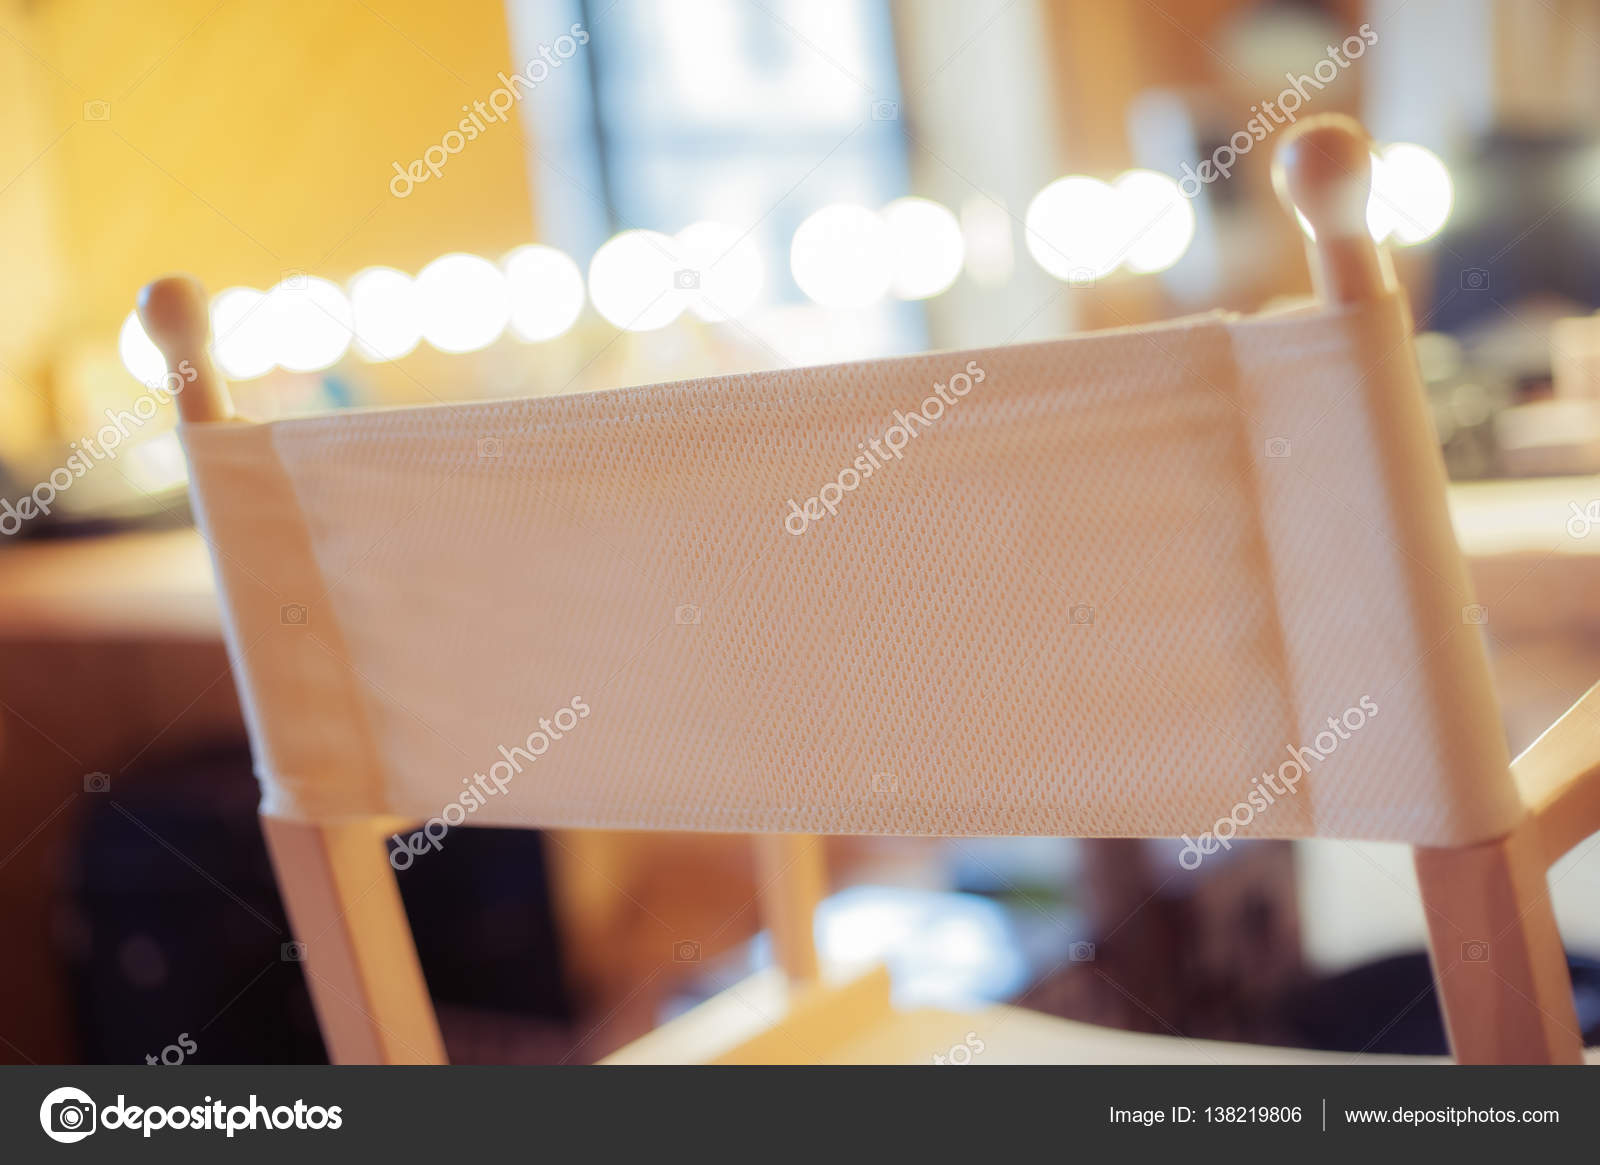 Make Up Stoel : De make up stoel u2014 stockfoto © guruxox #138219806